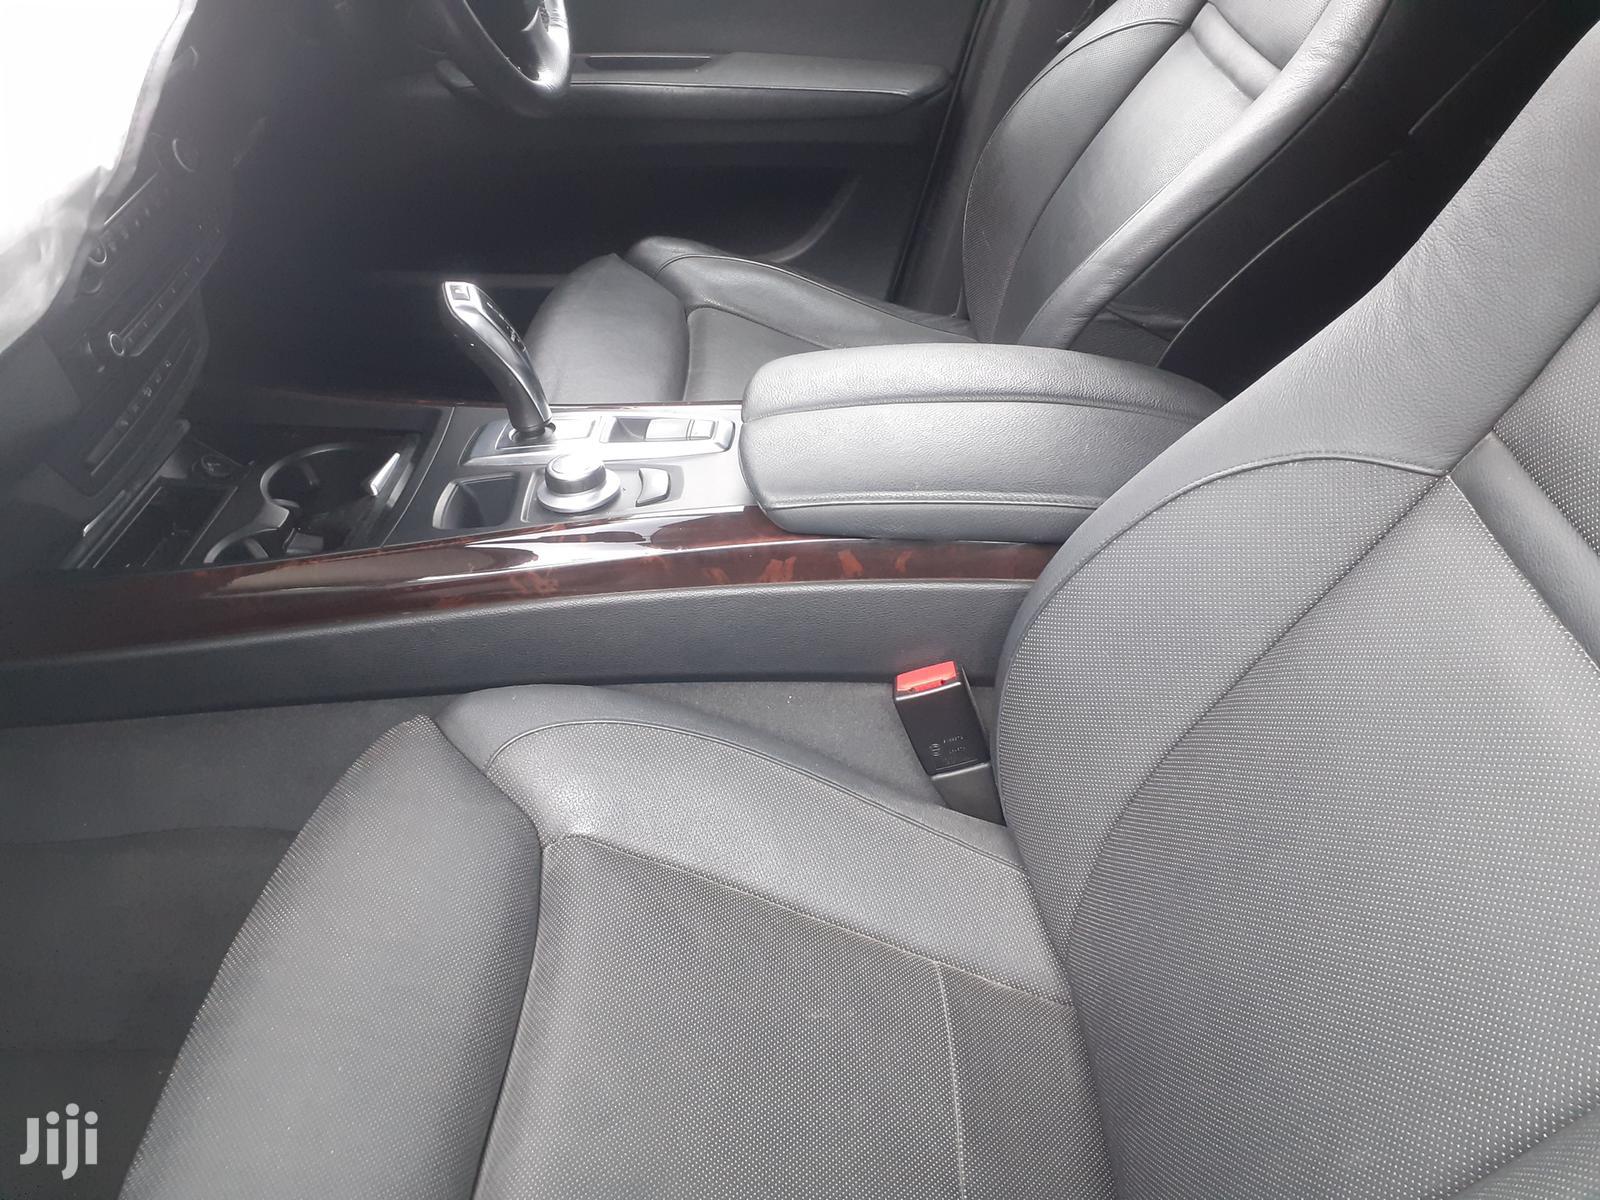 BMW X5 2012 Silver | Cars for sale in Mvita, Mombasa, Kenya